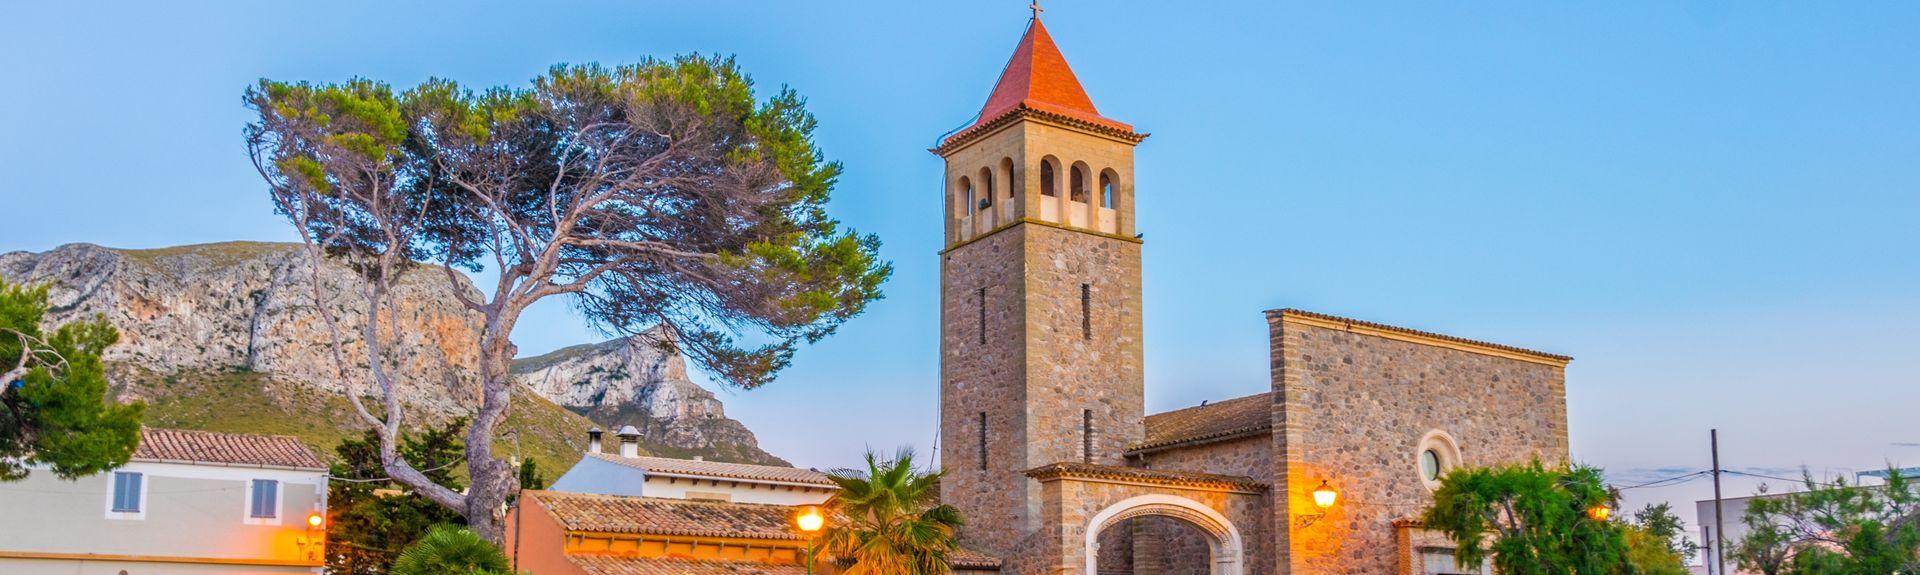 Colònia de Sant Pere, Artà, Balearen, Spanien